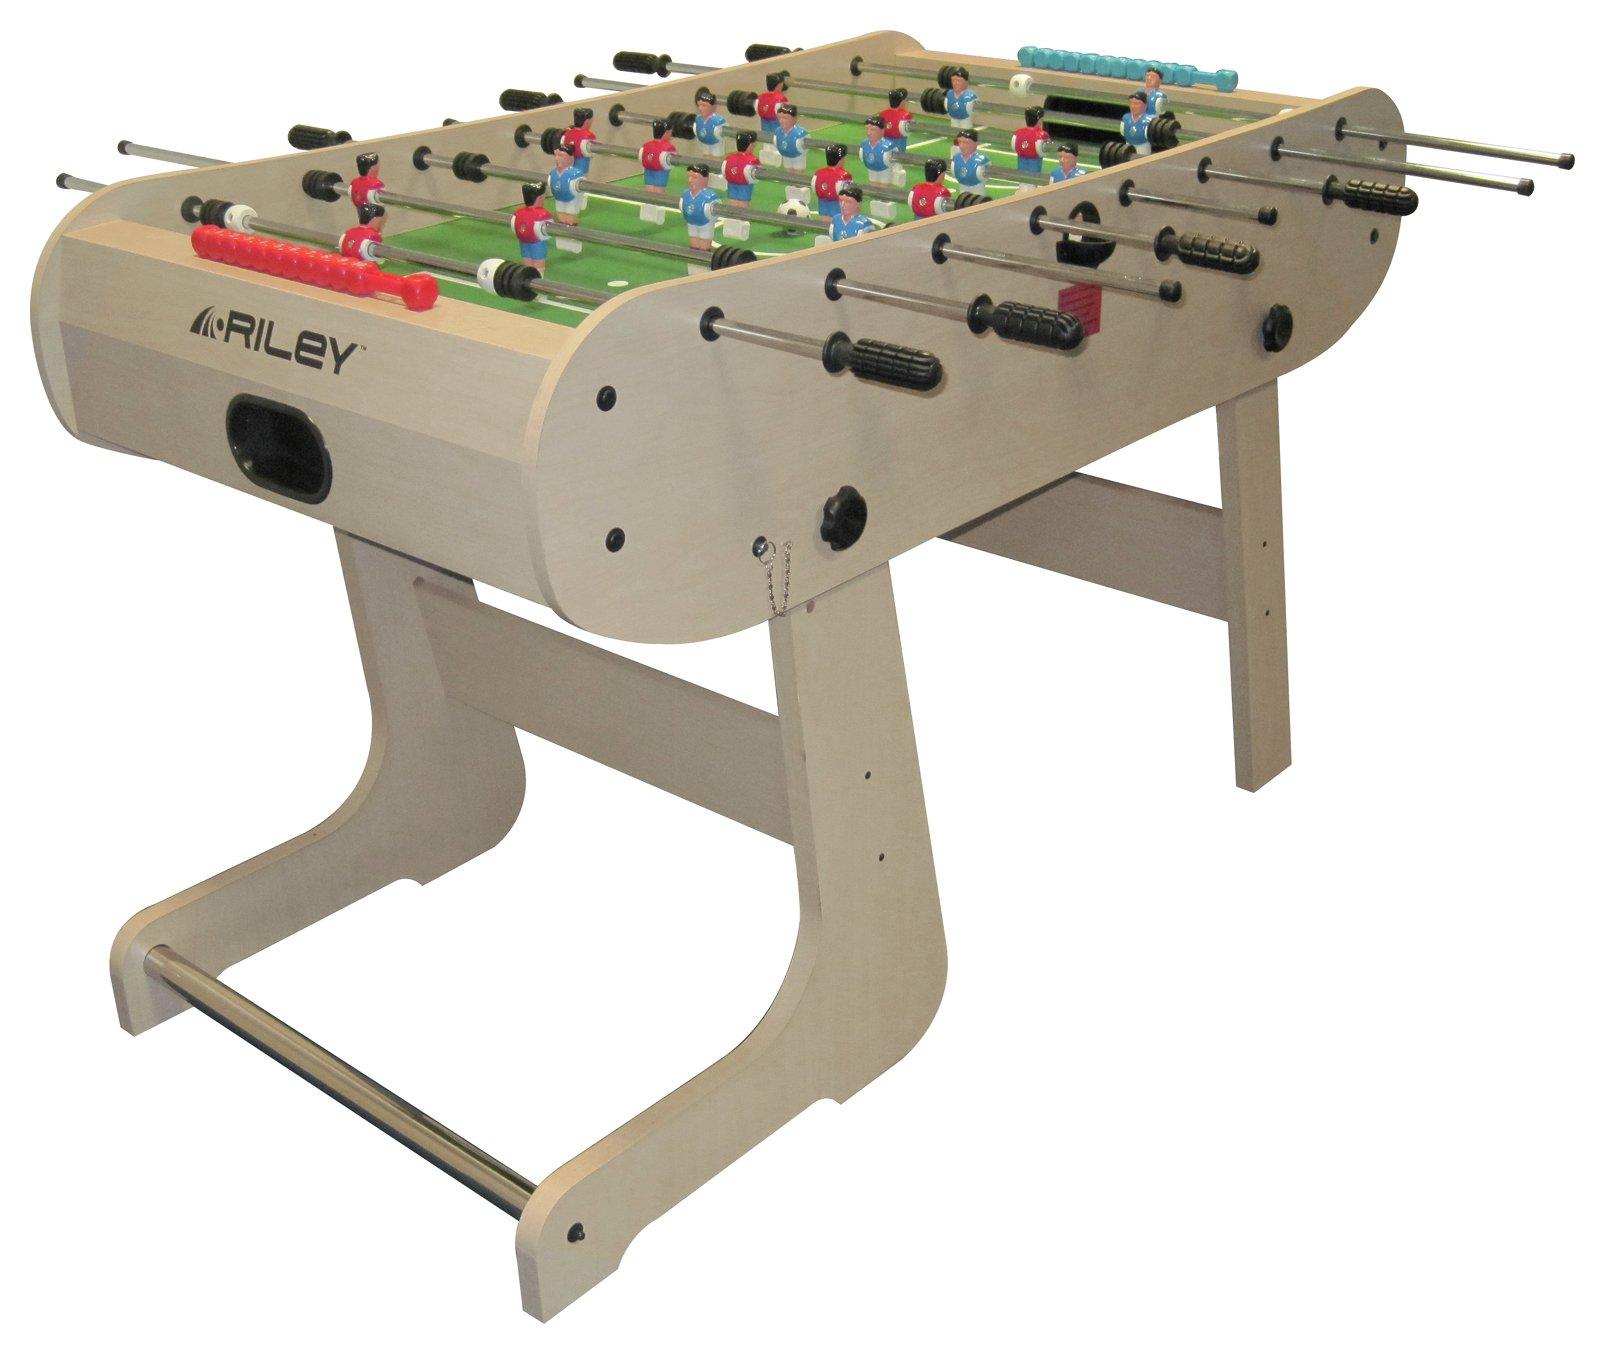 Riley 4`6 inch Folding Football Table.